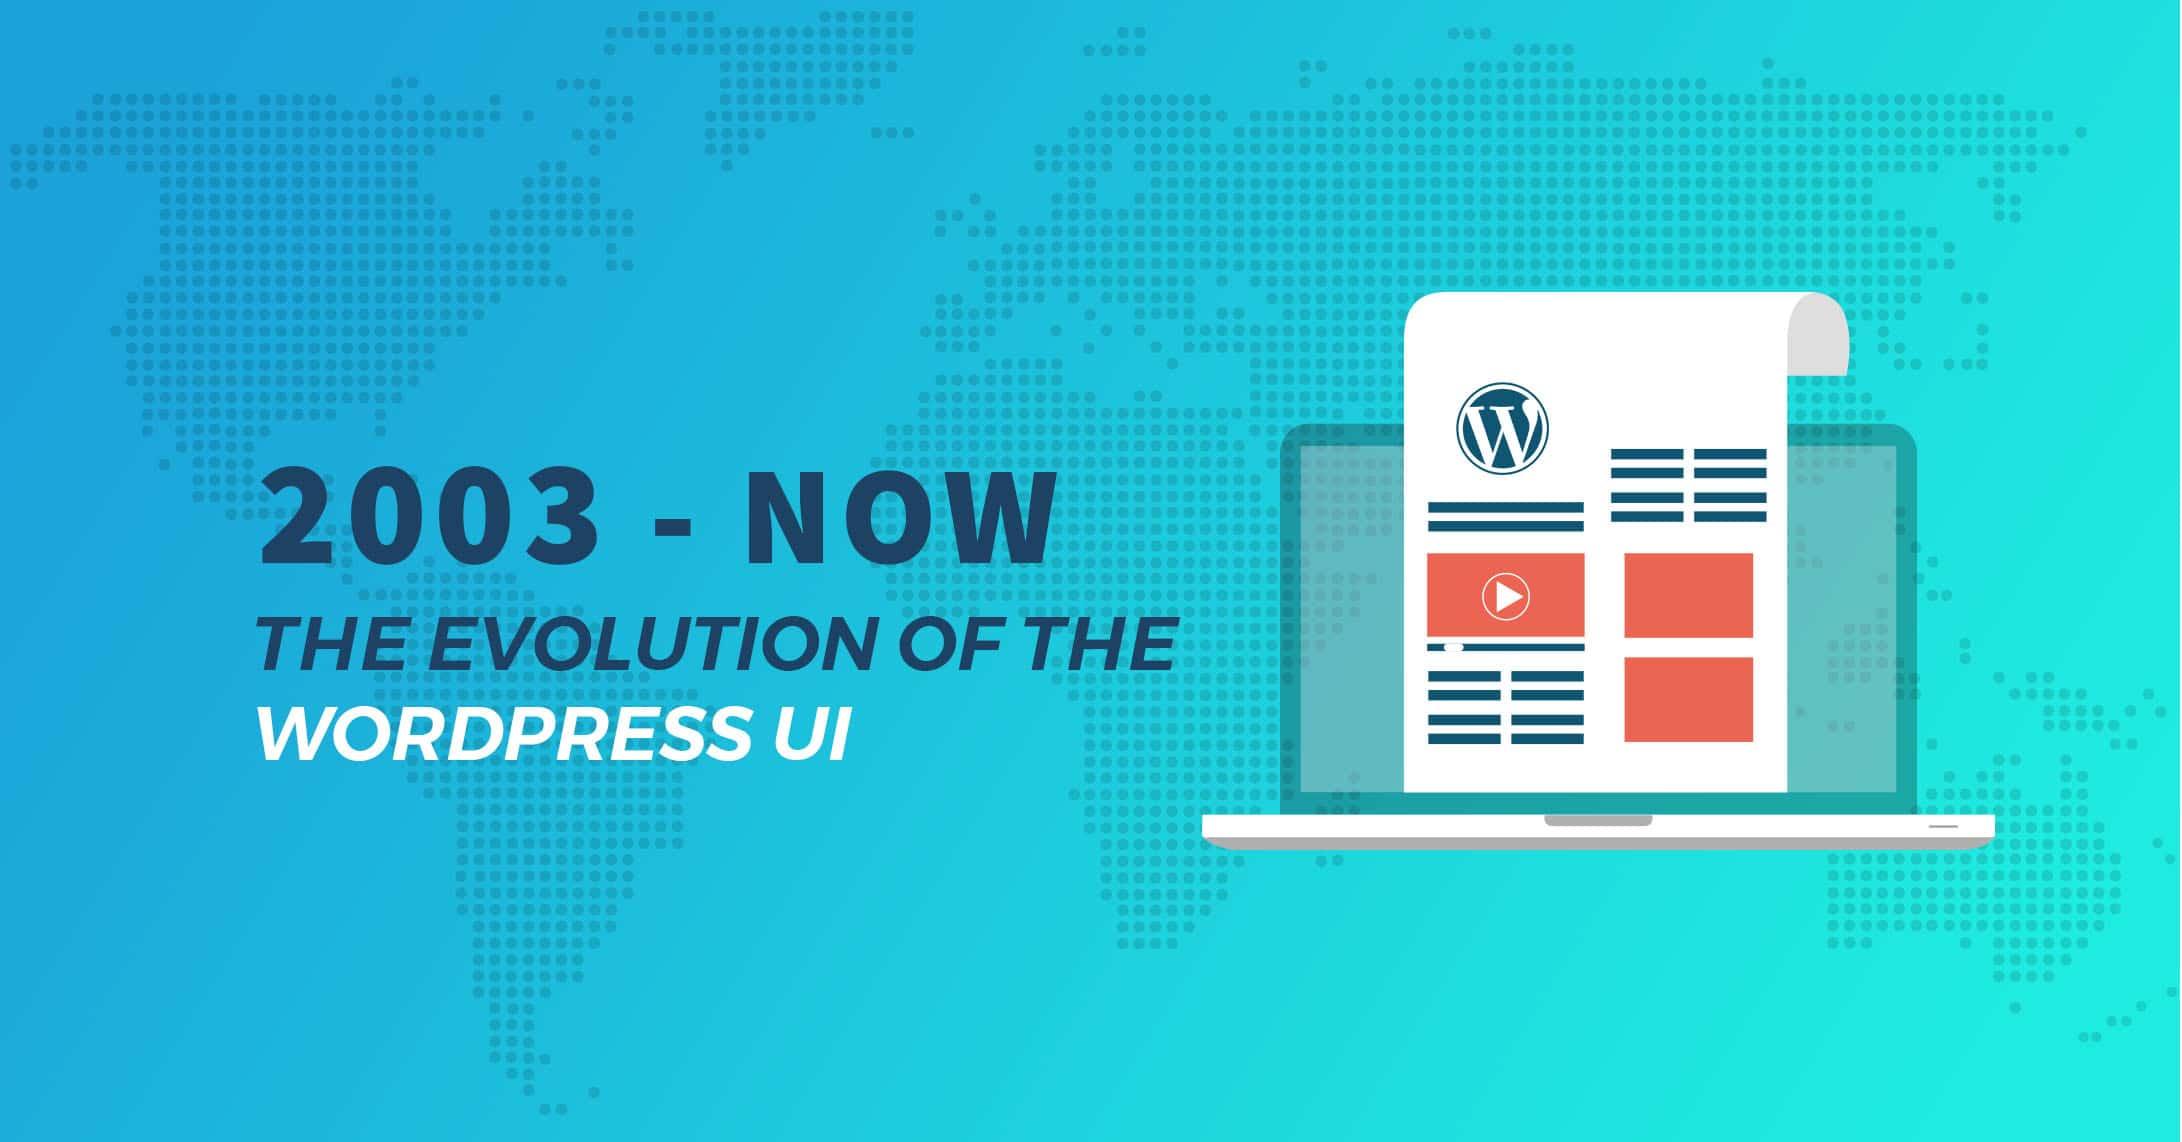 The evolution of WordPress UI